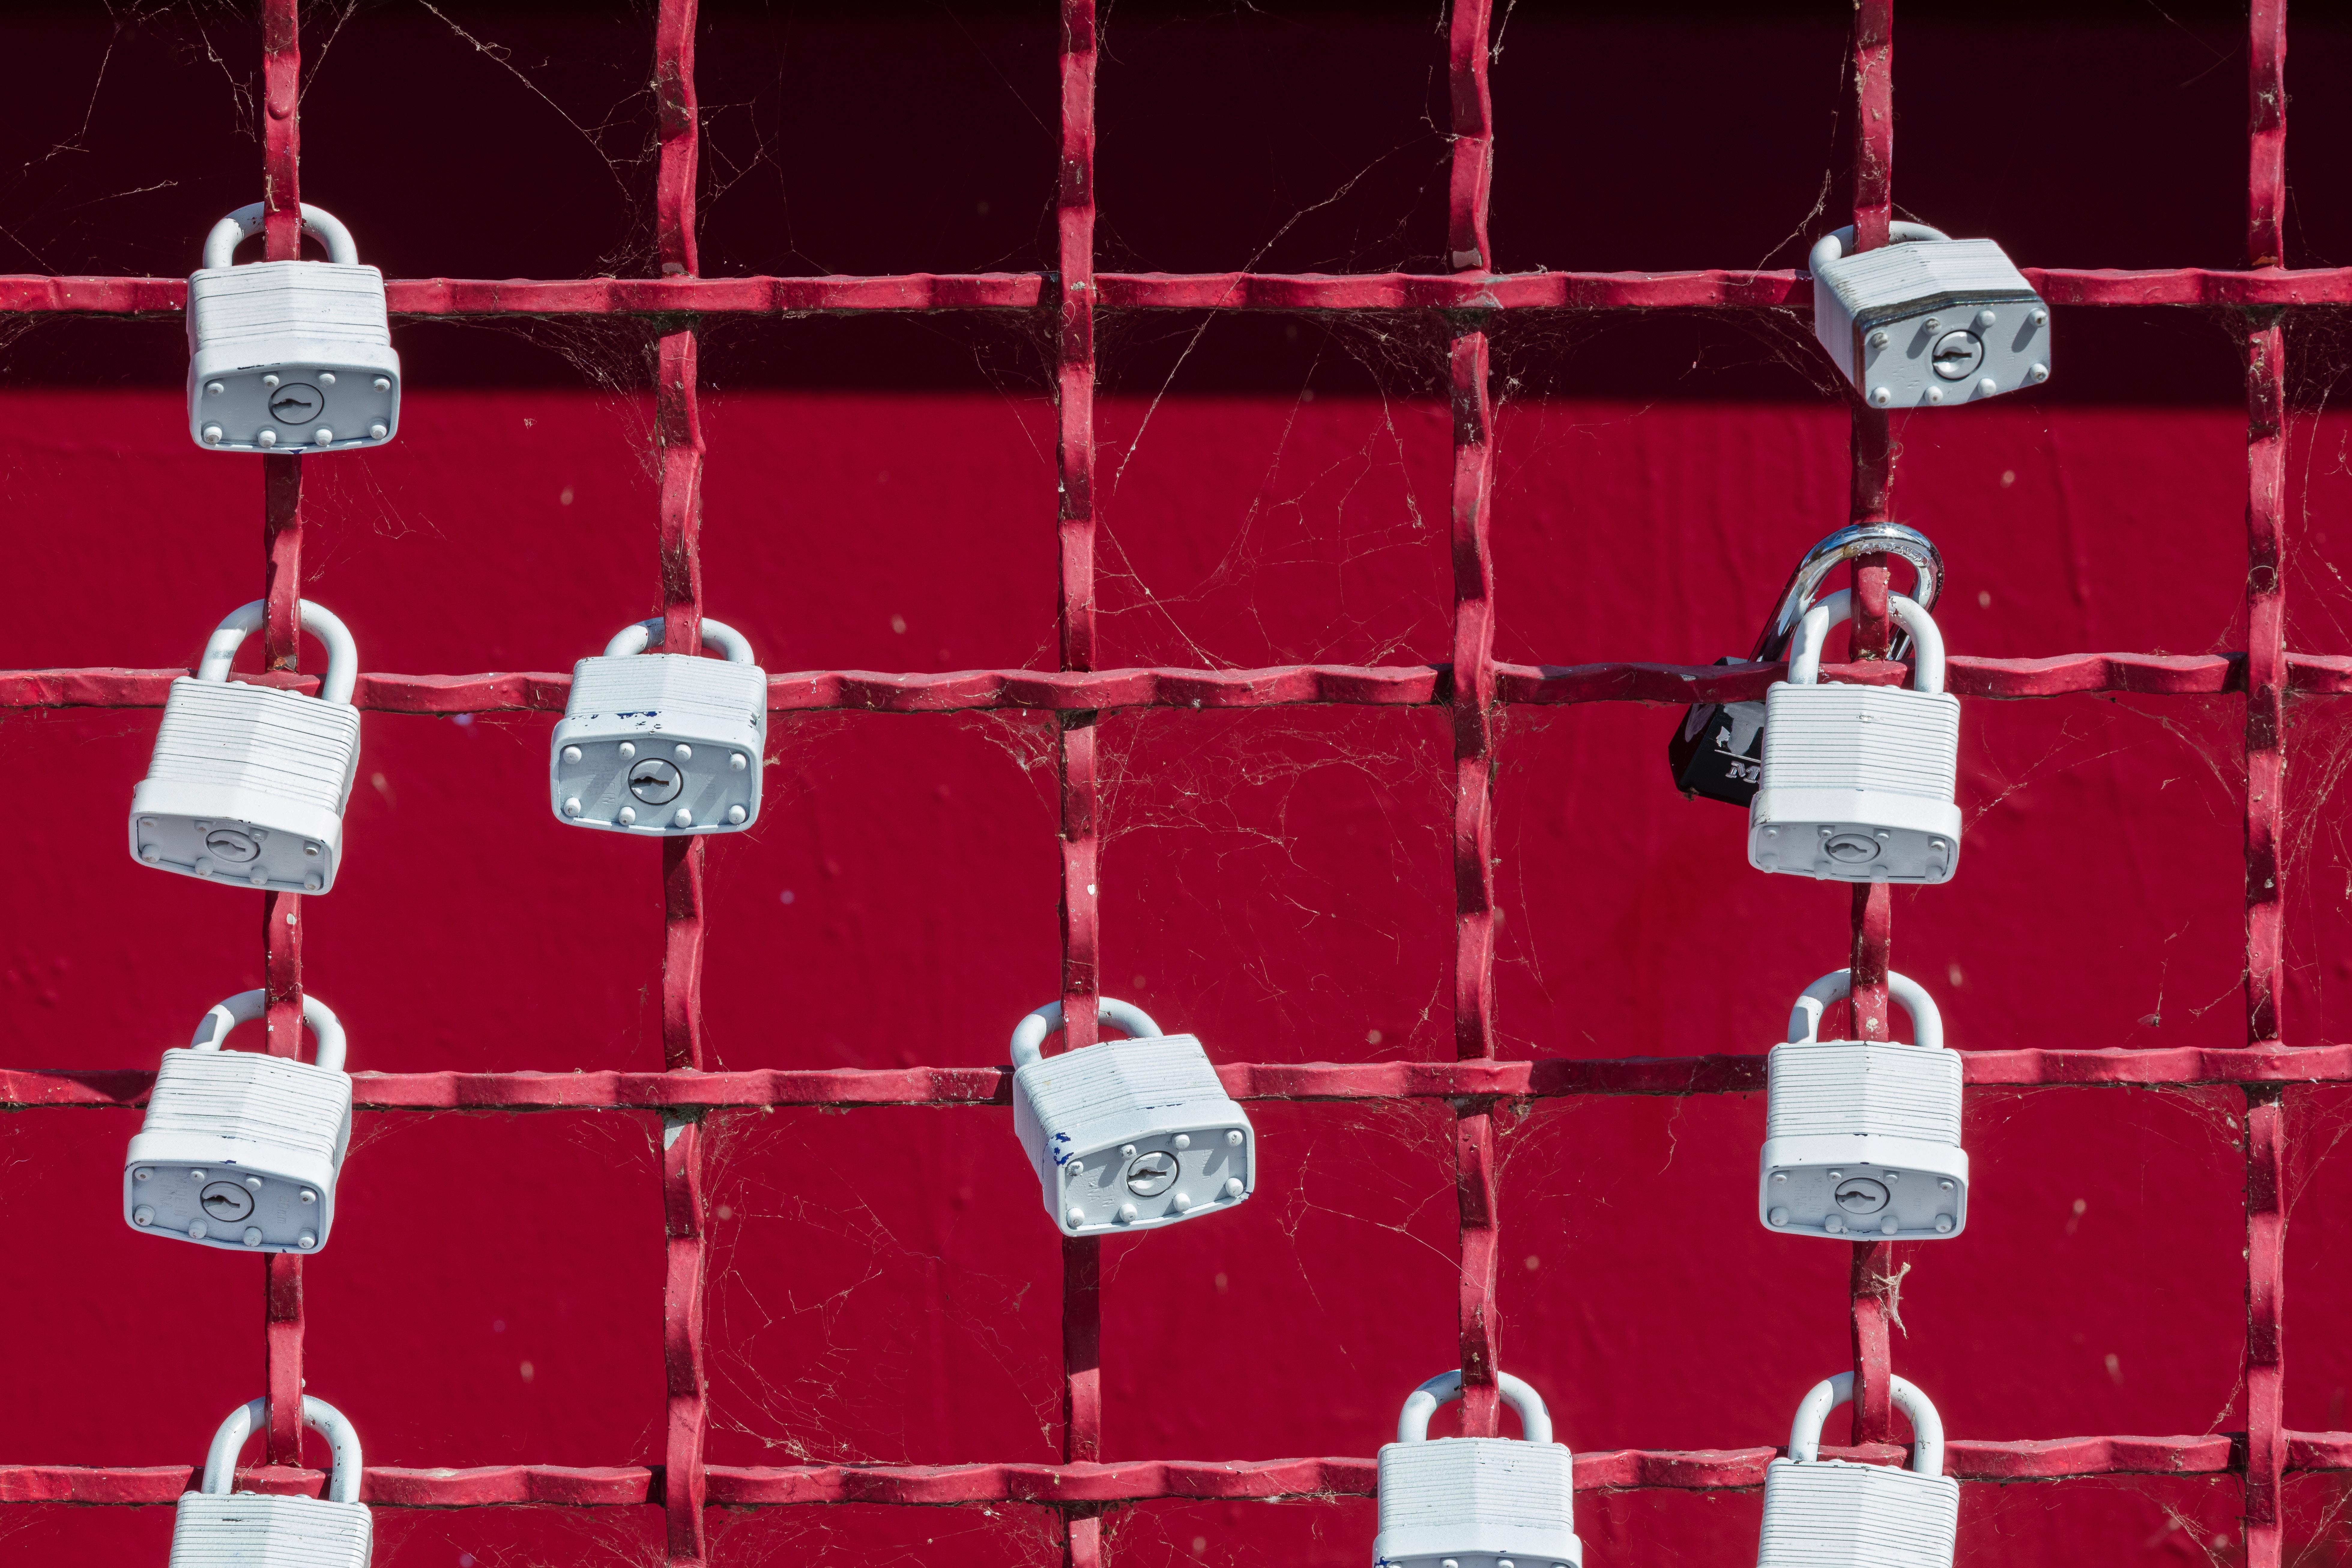 Security Tokens: The Next Crypto Revolution